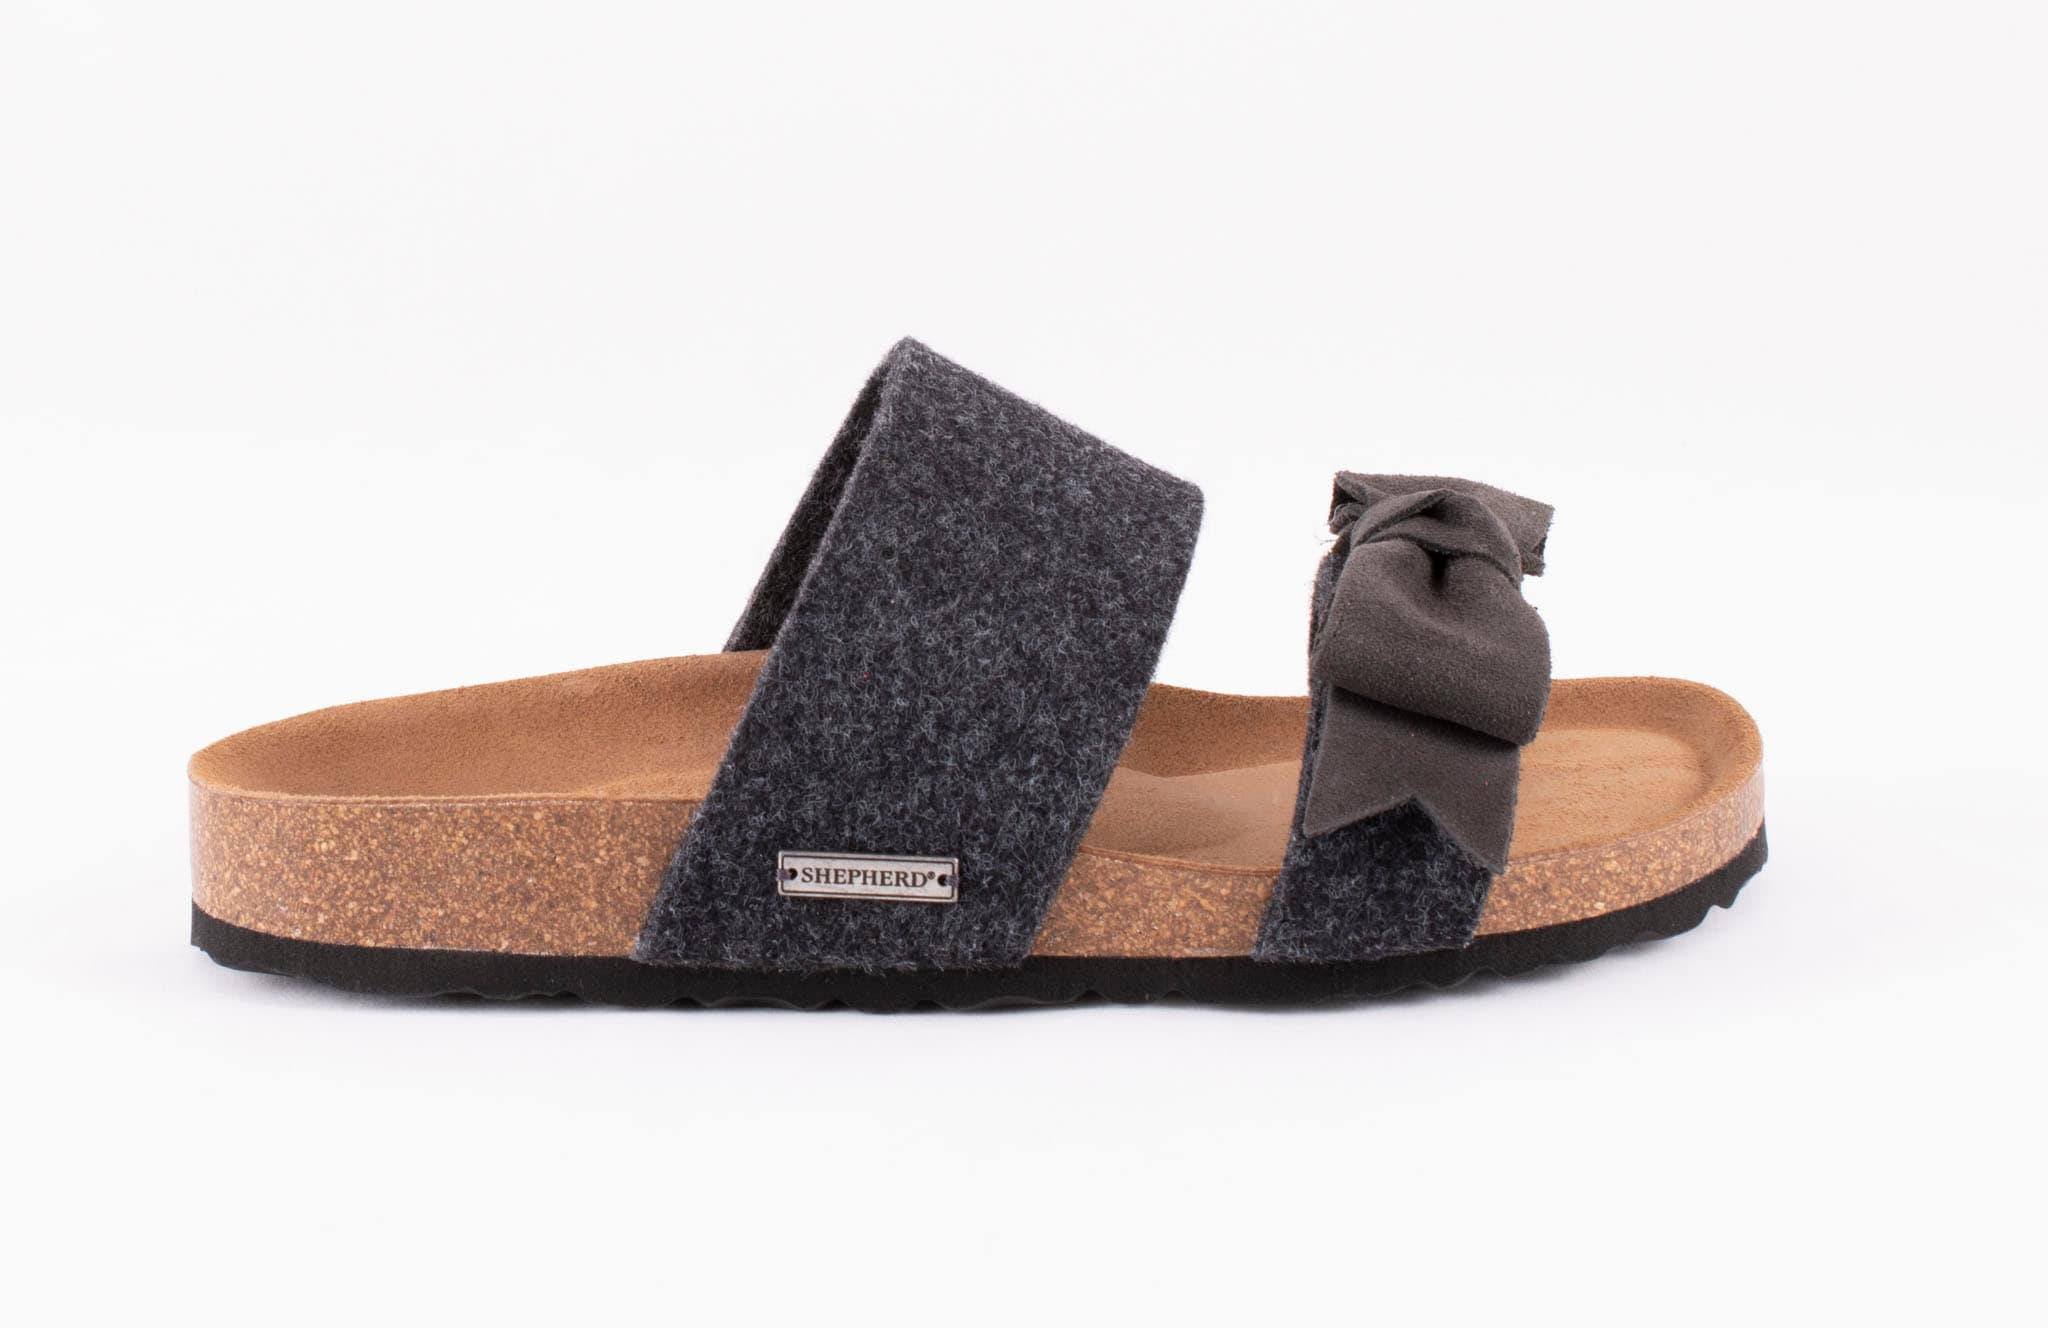 Elisabet sandals